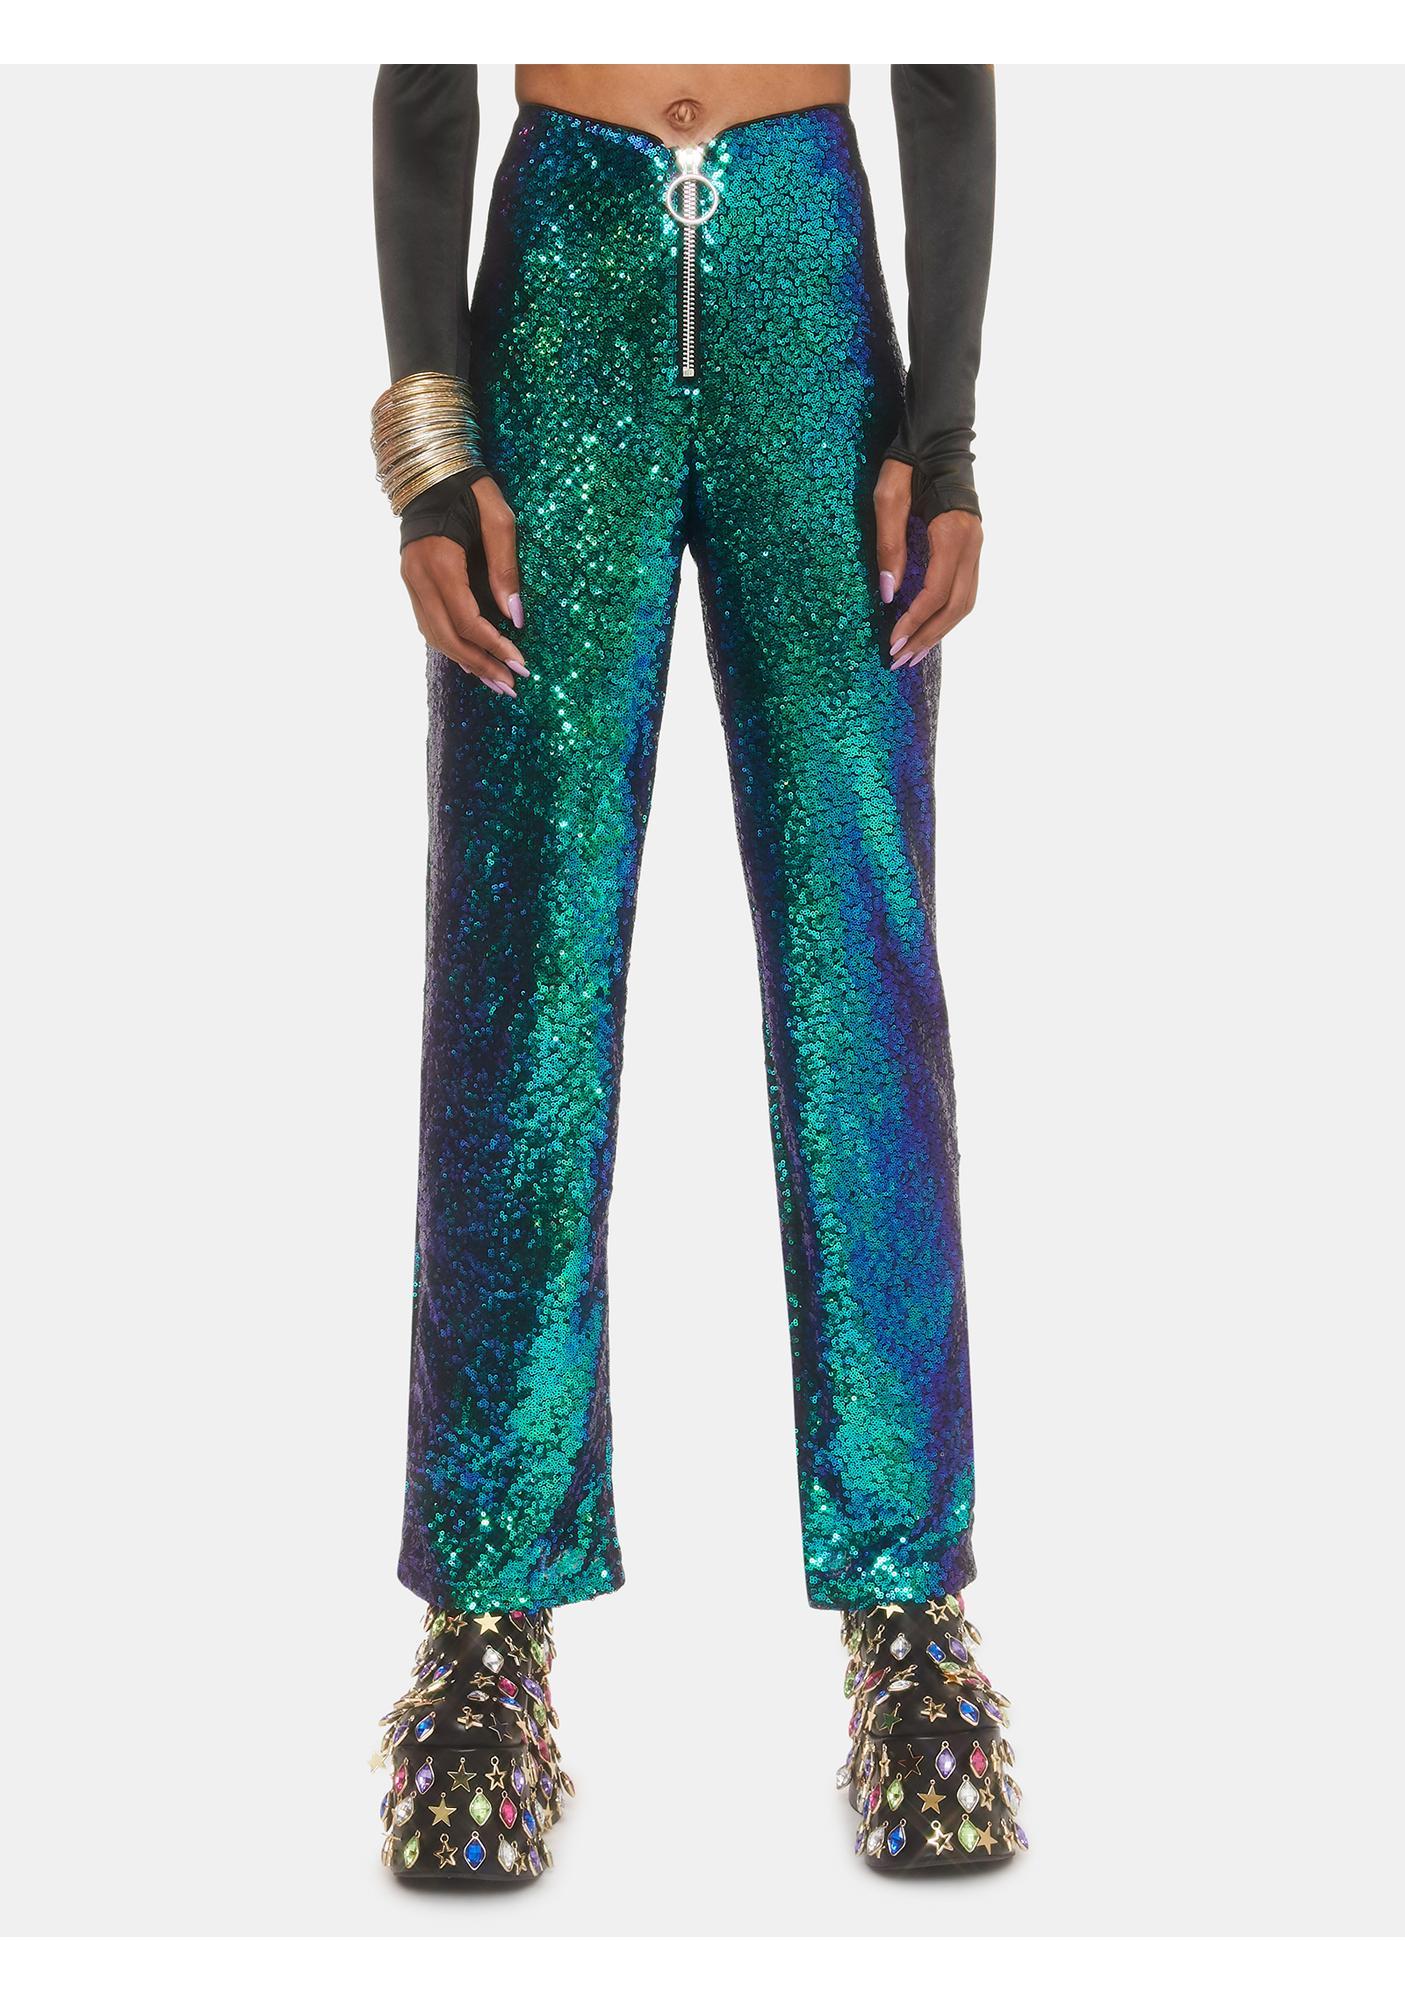 Club Exx Neptune Glimmer Sequin Pants